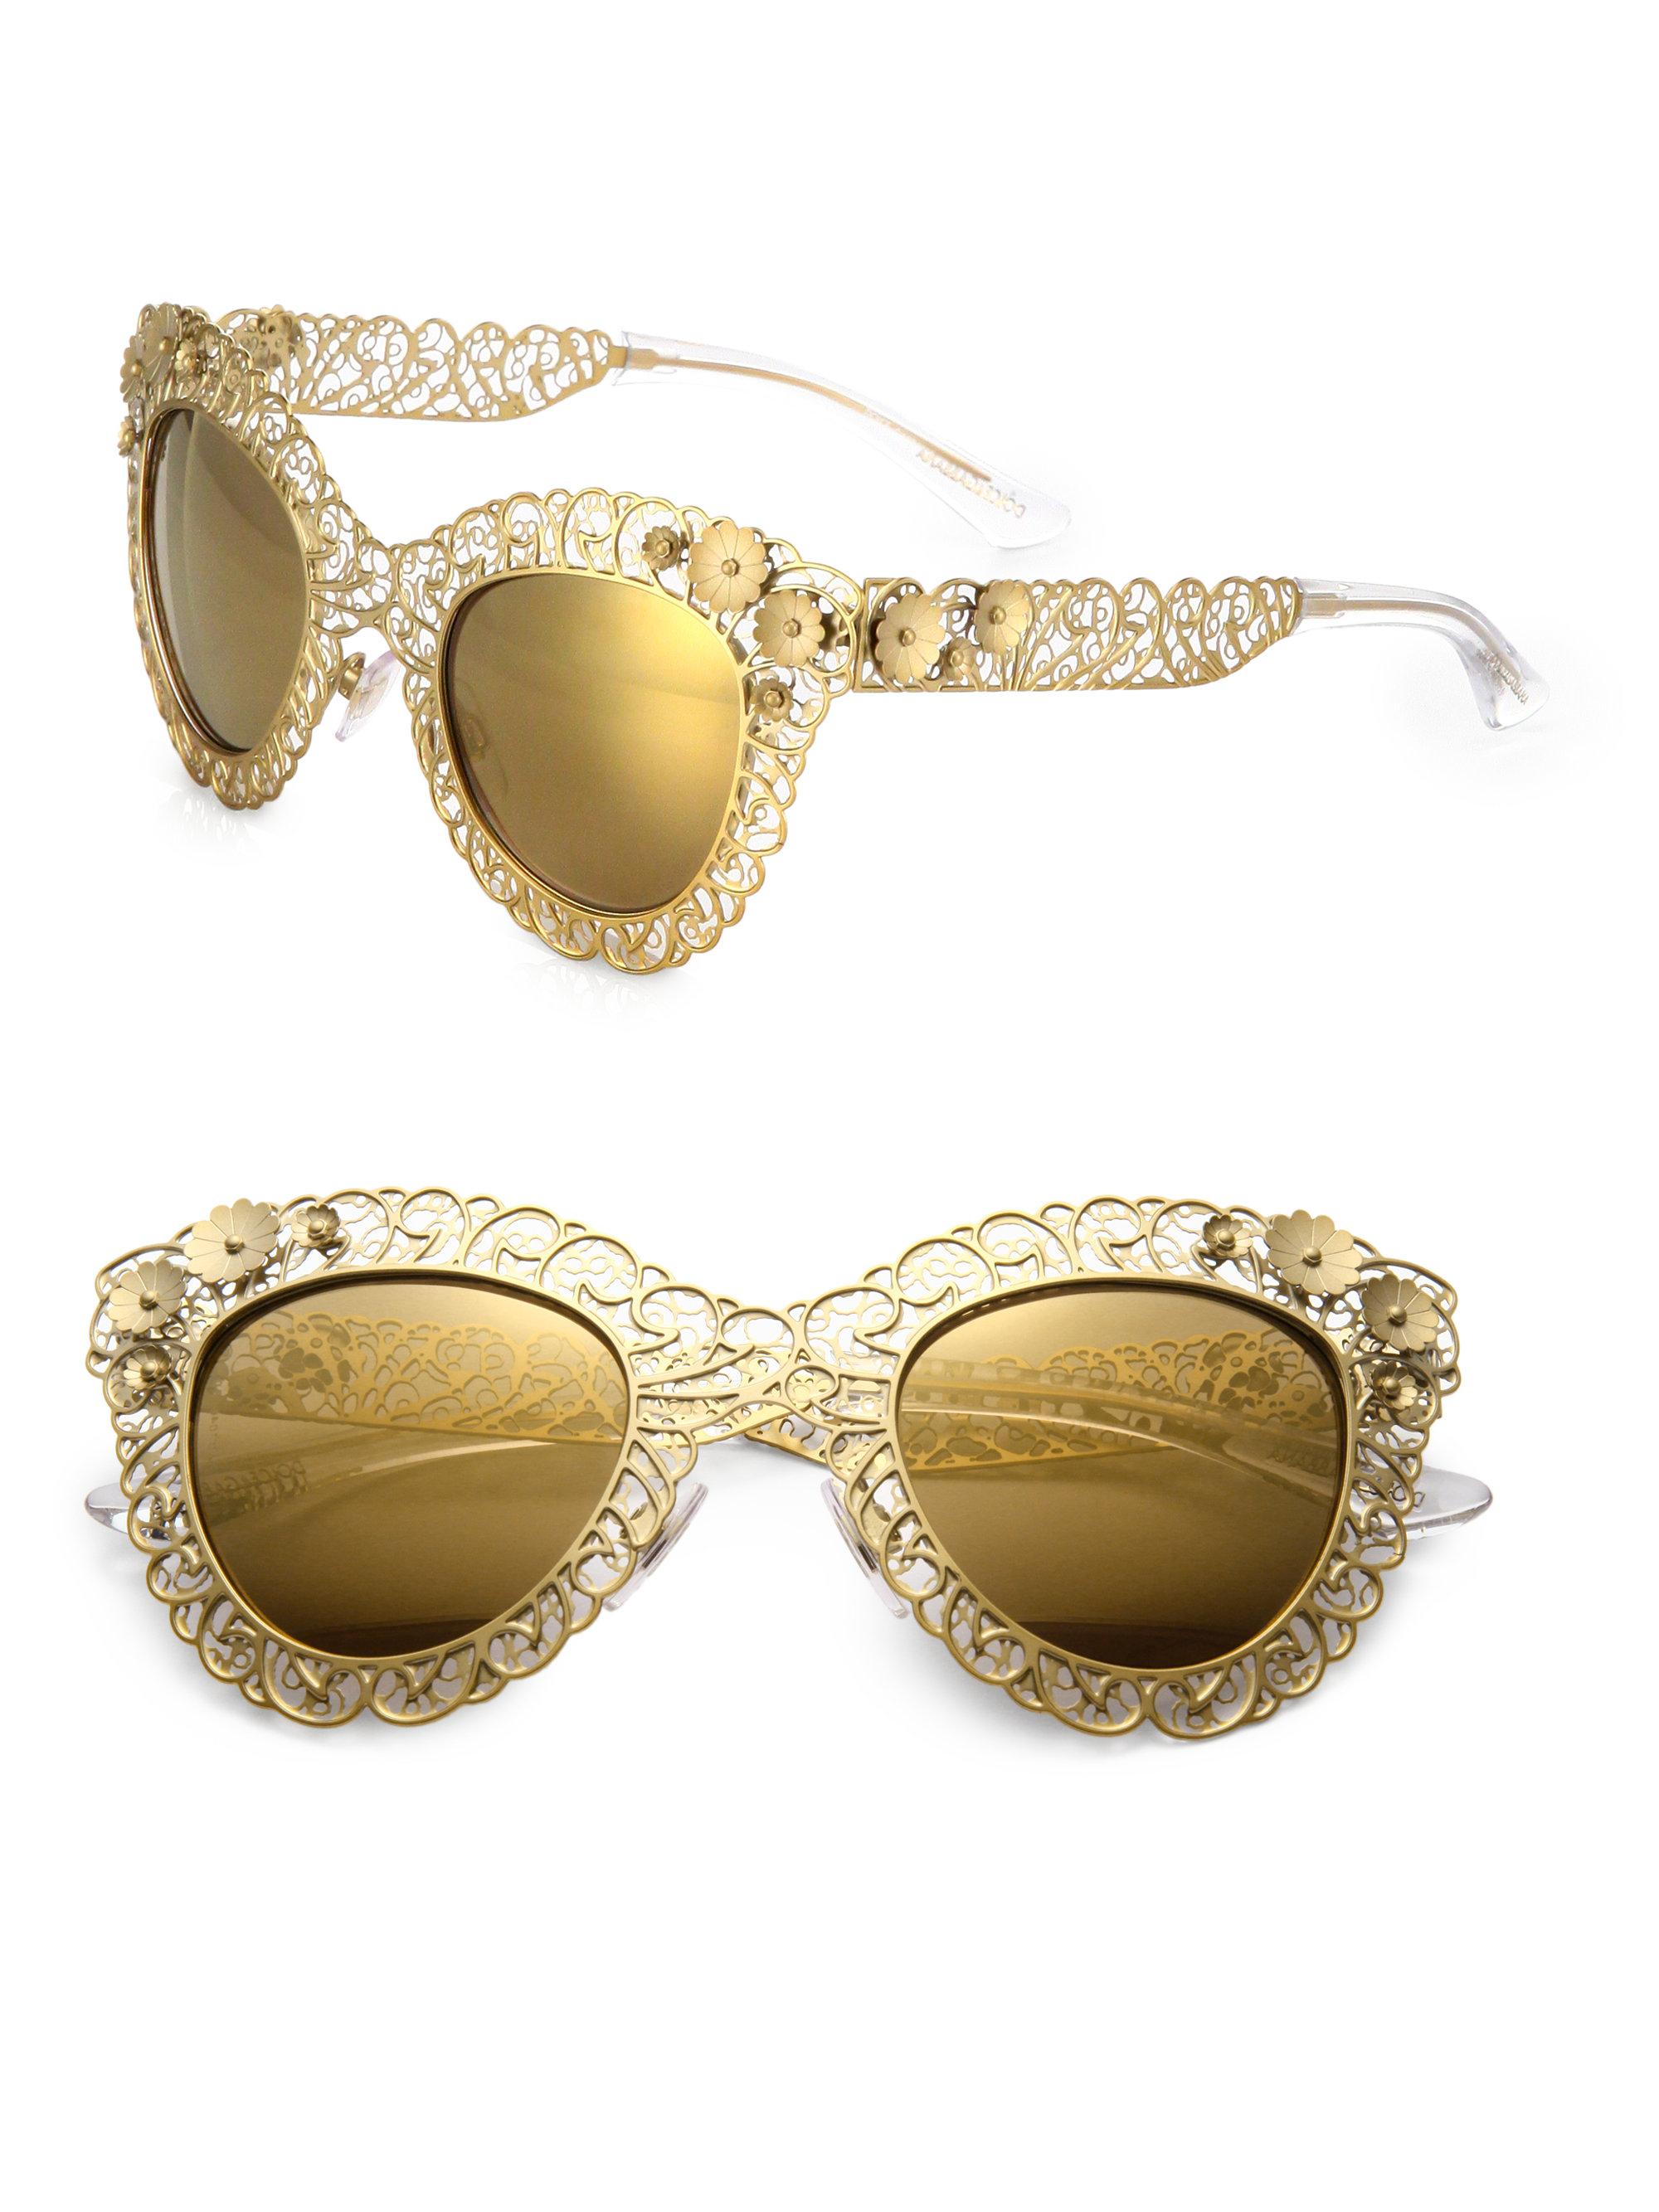 49612ad21bd Dolce Gabbana Sunglasses 3000